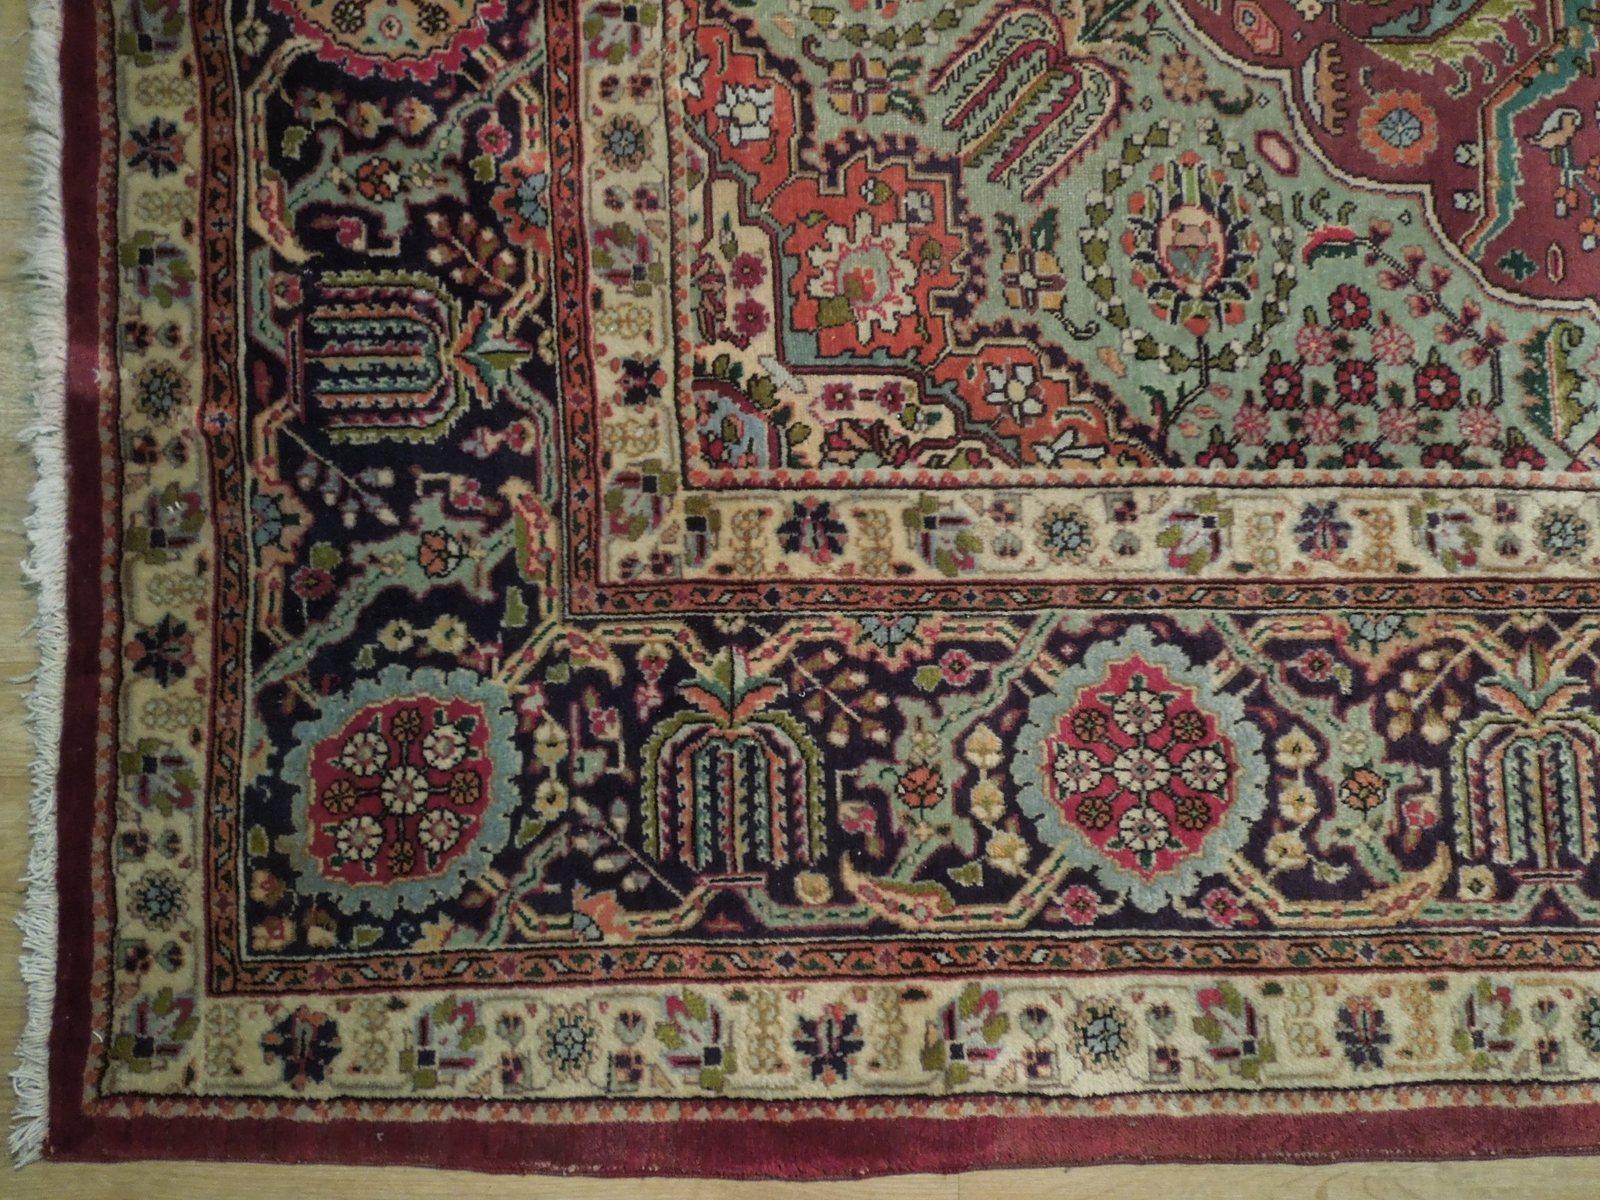 Compex Design Original Red Traditional Persian Wool Handmade Rug 10x16 Rug image 7